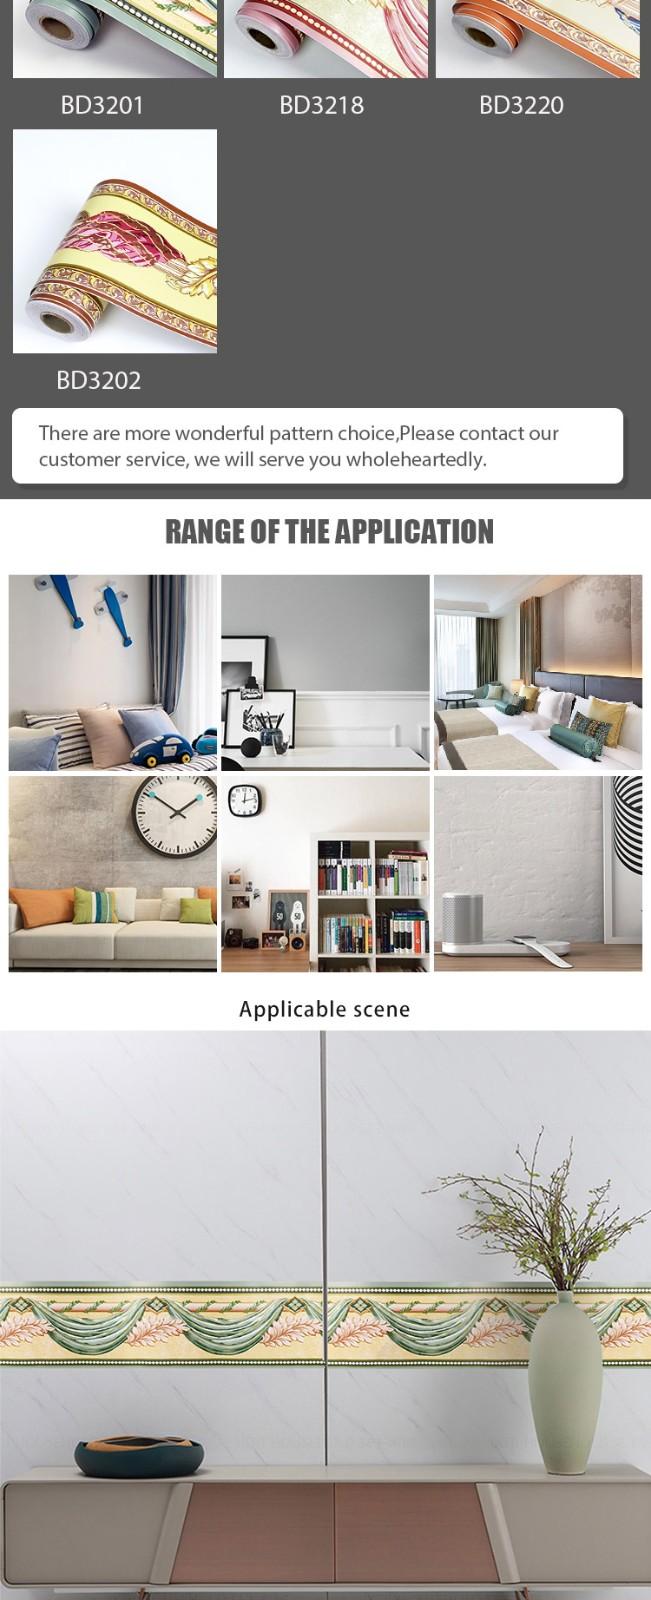 SUNYE latest self adhesive wallpaper borders best supplier bulk buy-4